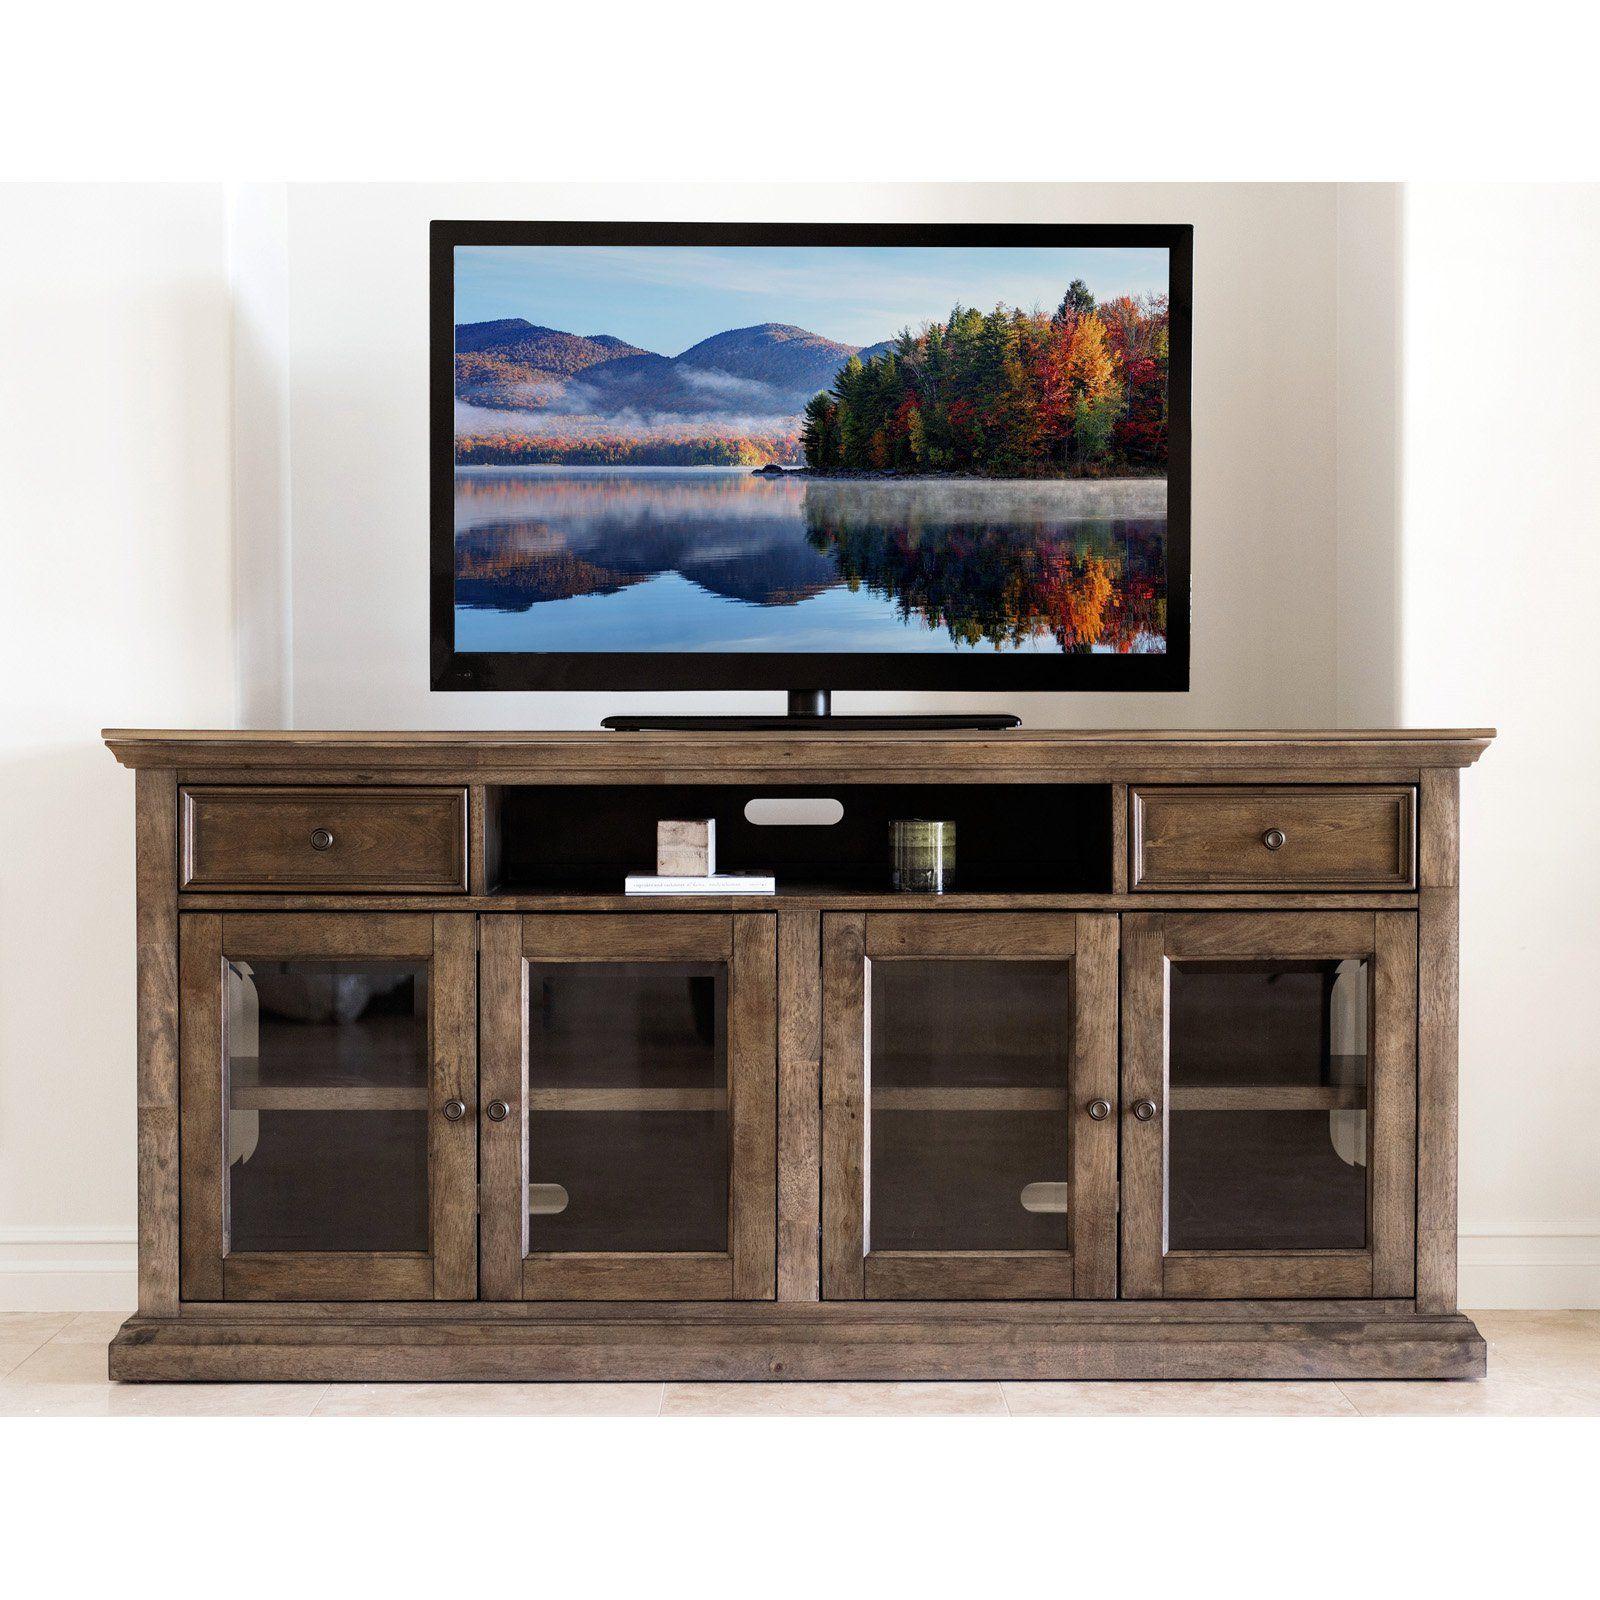 Abbyson Living Fontana Oak 75 in Multi Use TV Console RK 4331 324